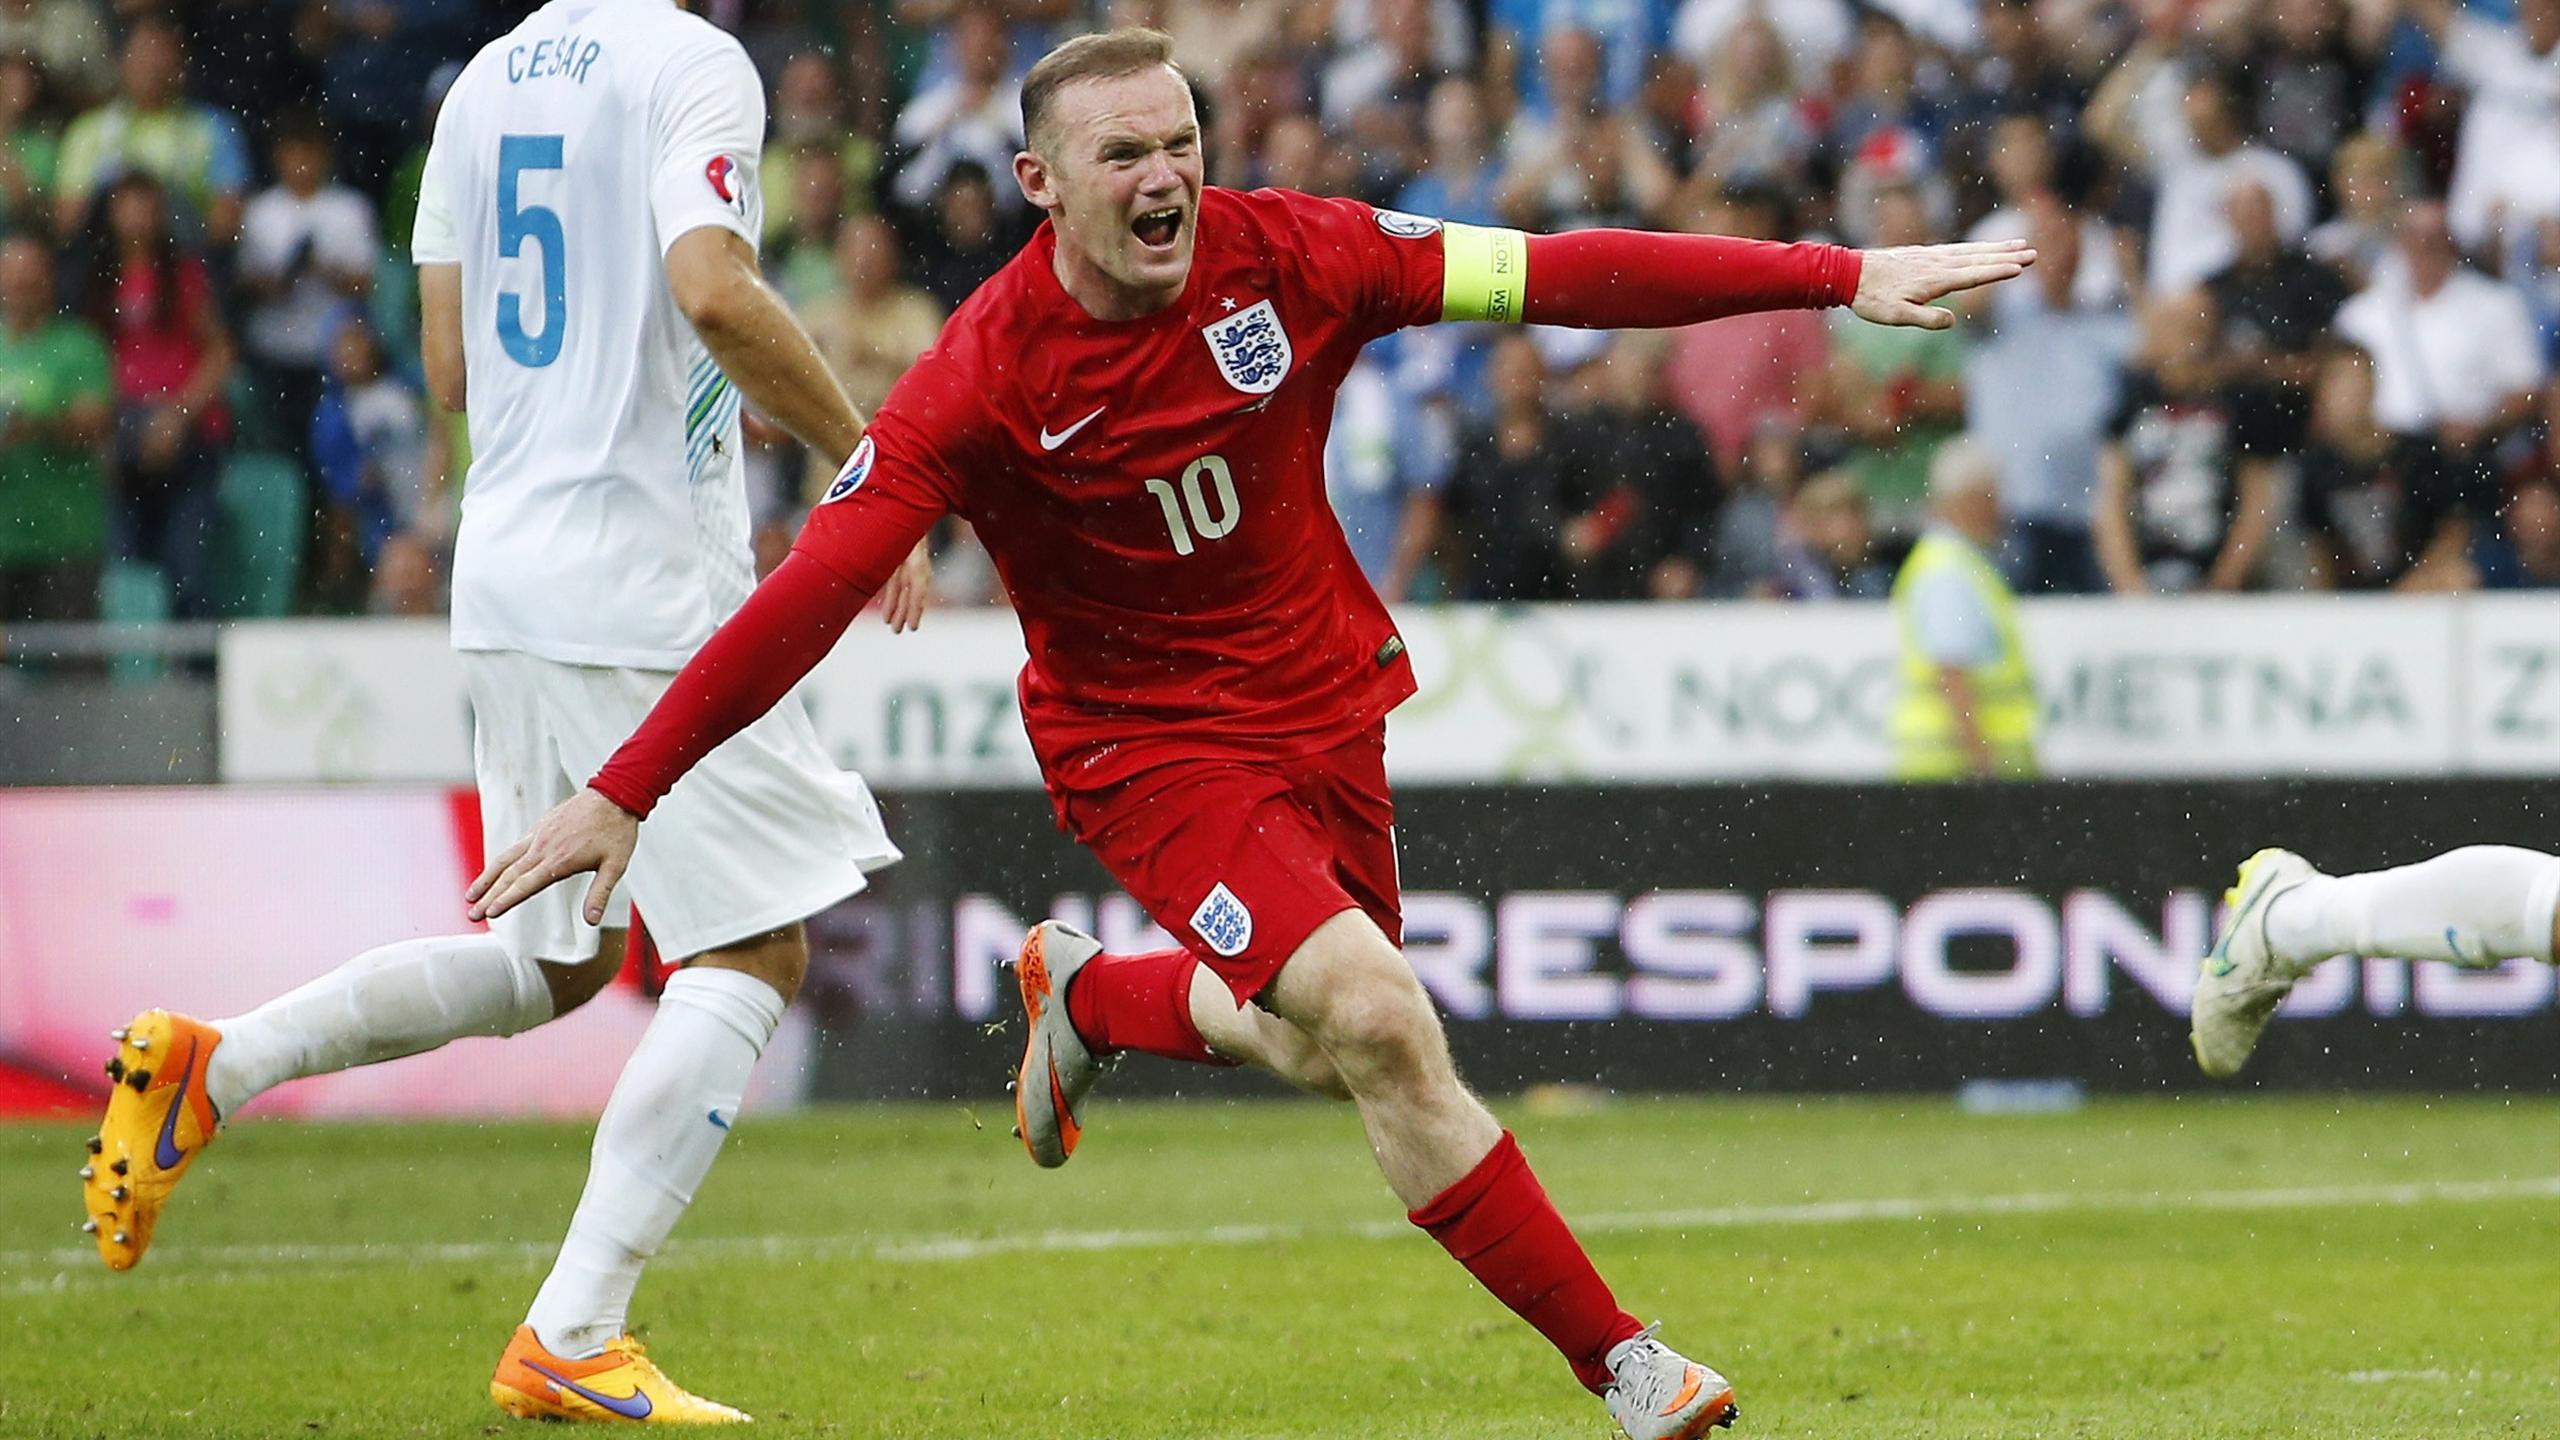 Уэйн Руни в матче за сборную Англии